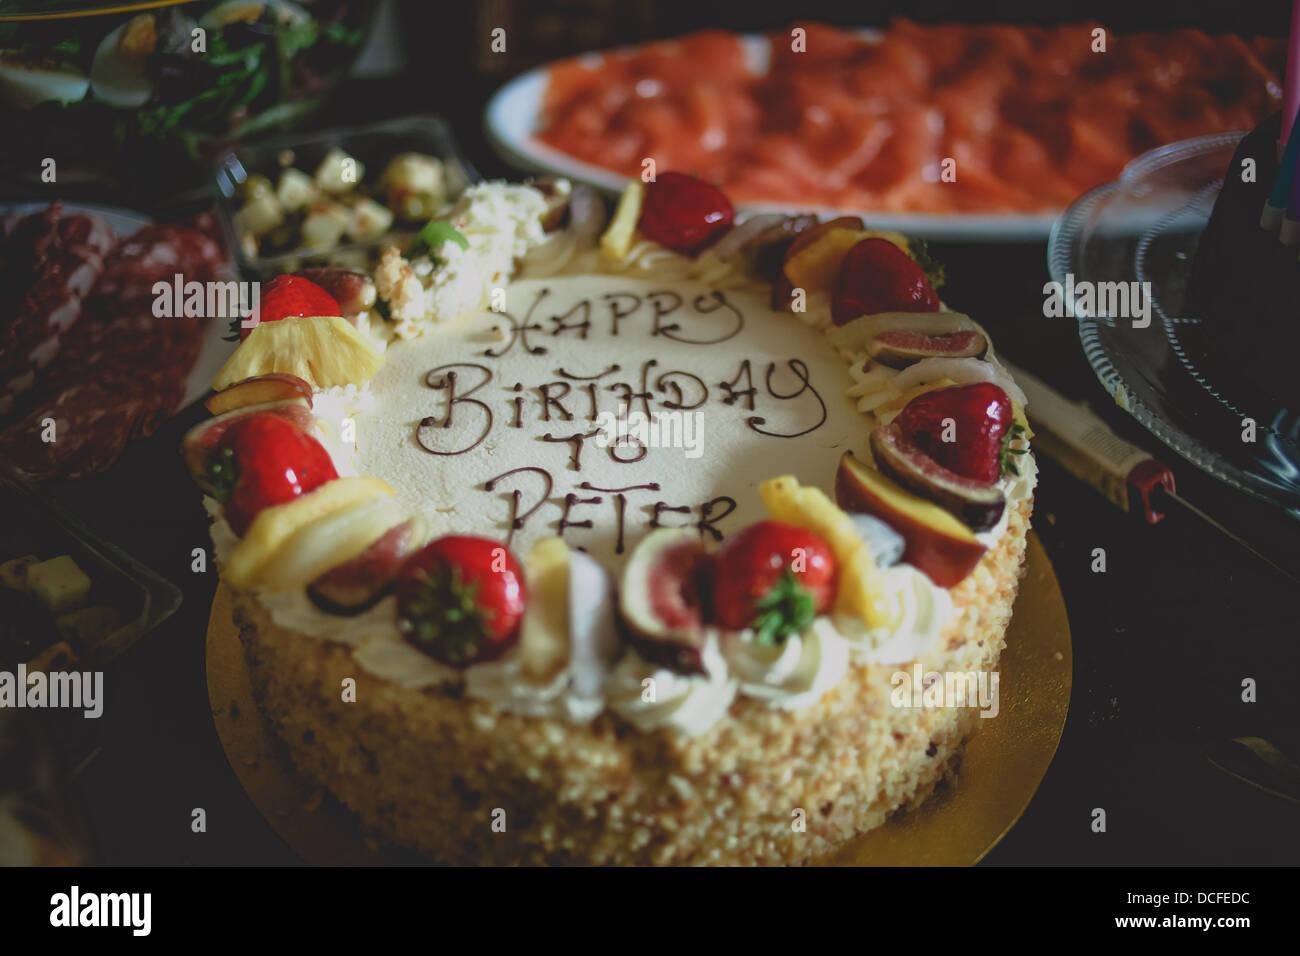 White Chocolate Birthday Cake To Peter Stock Photo Alamy